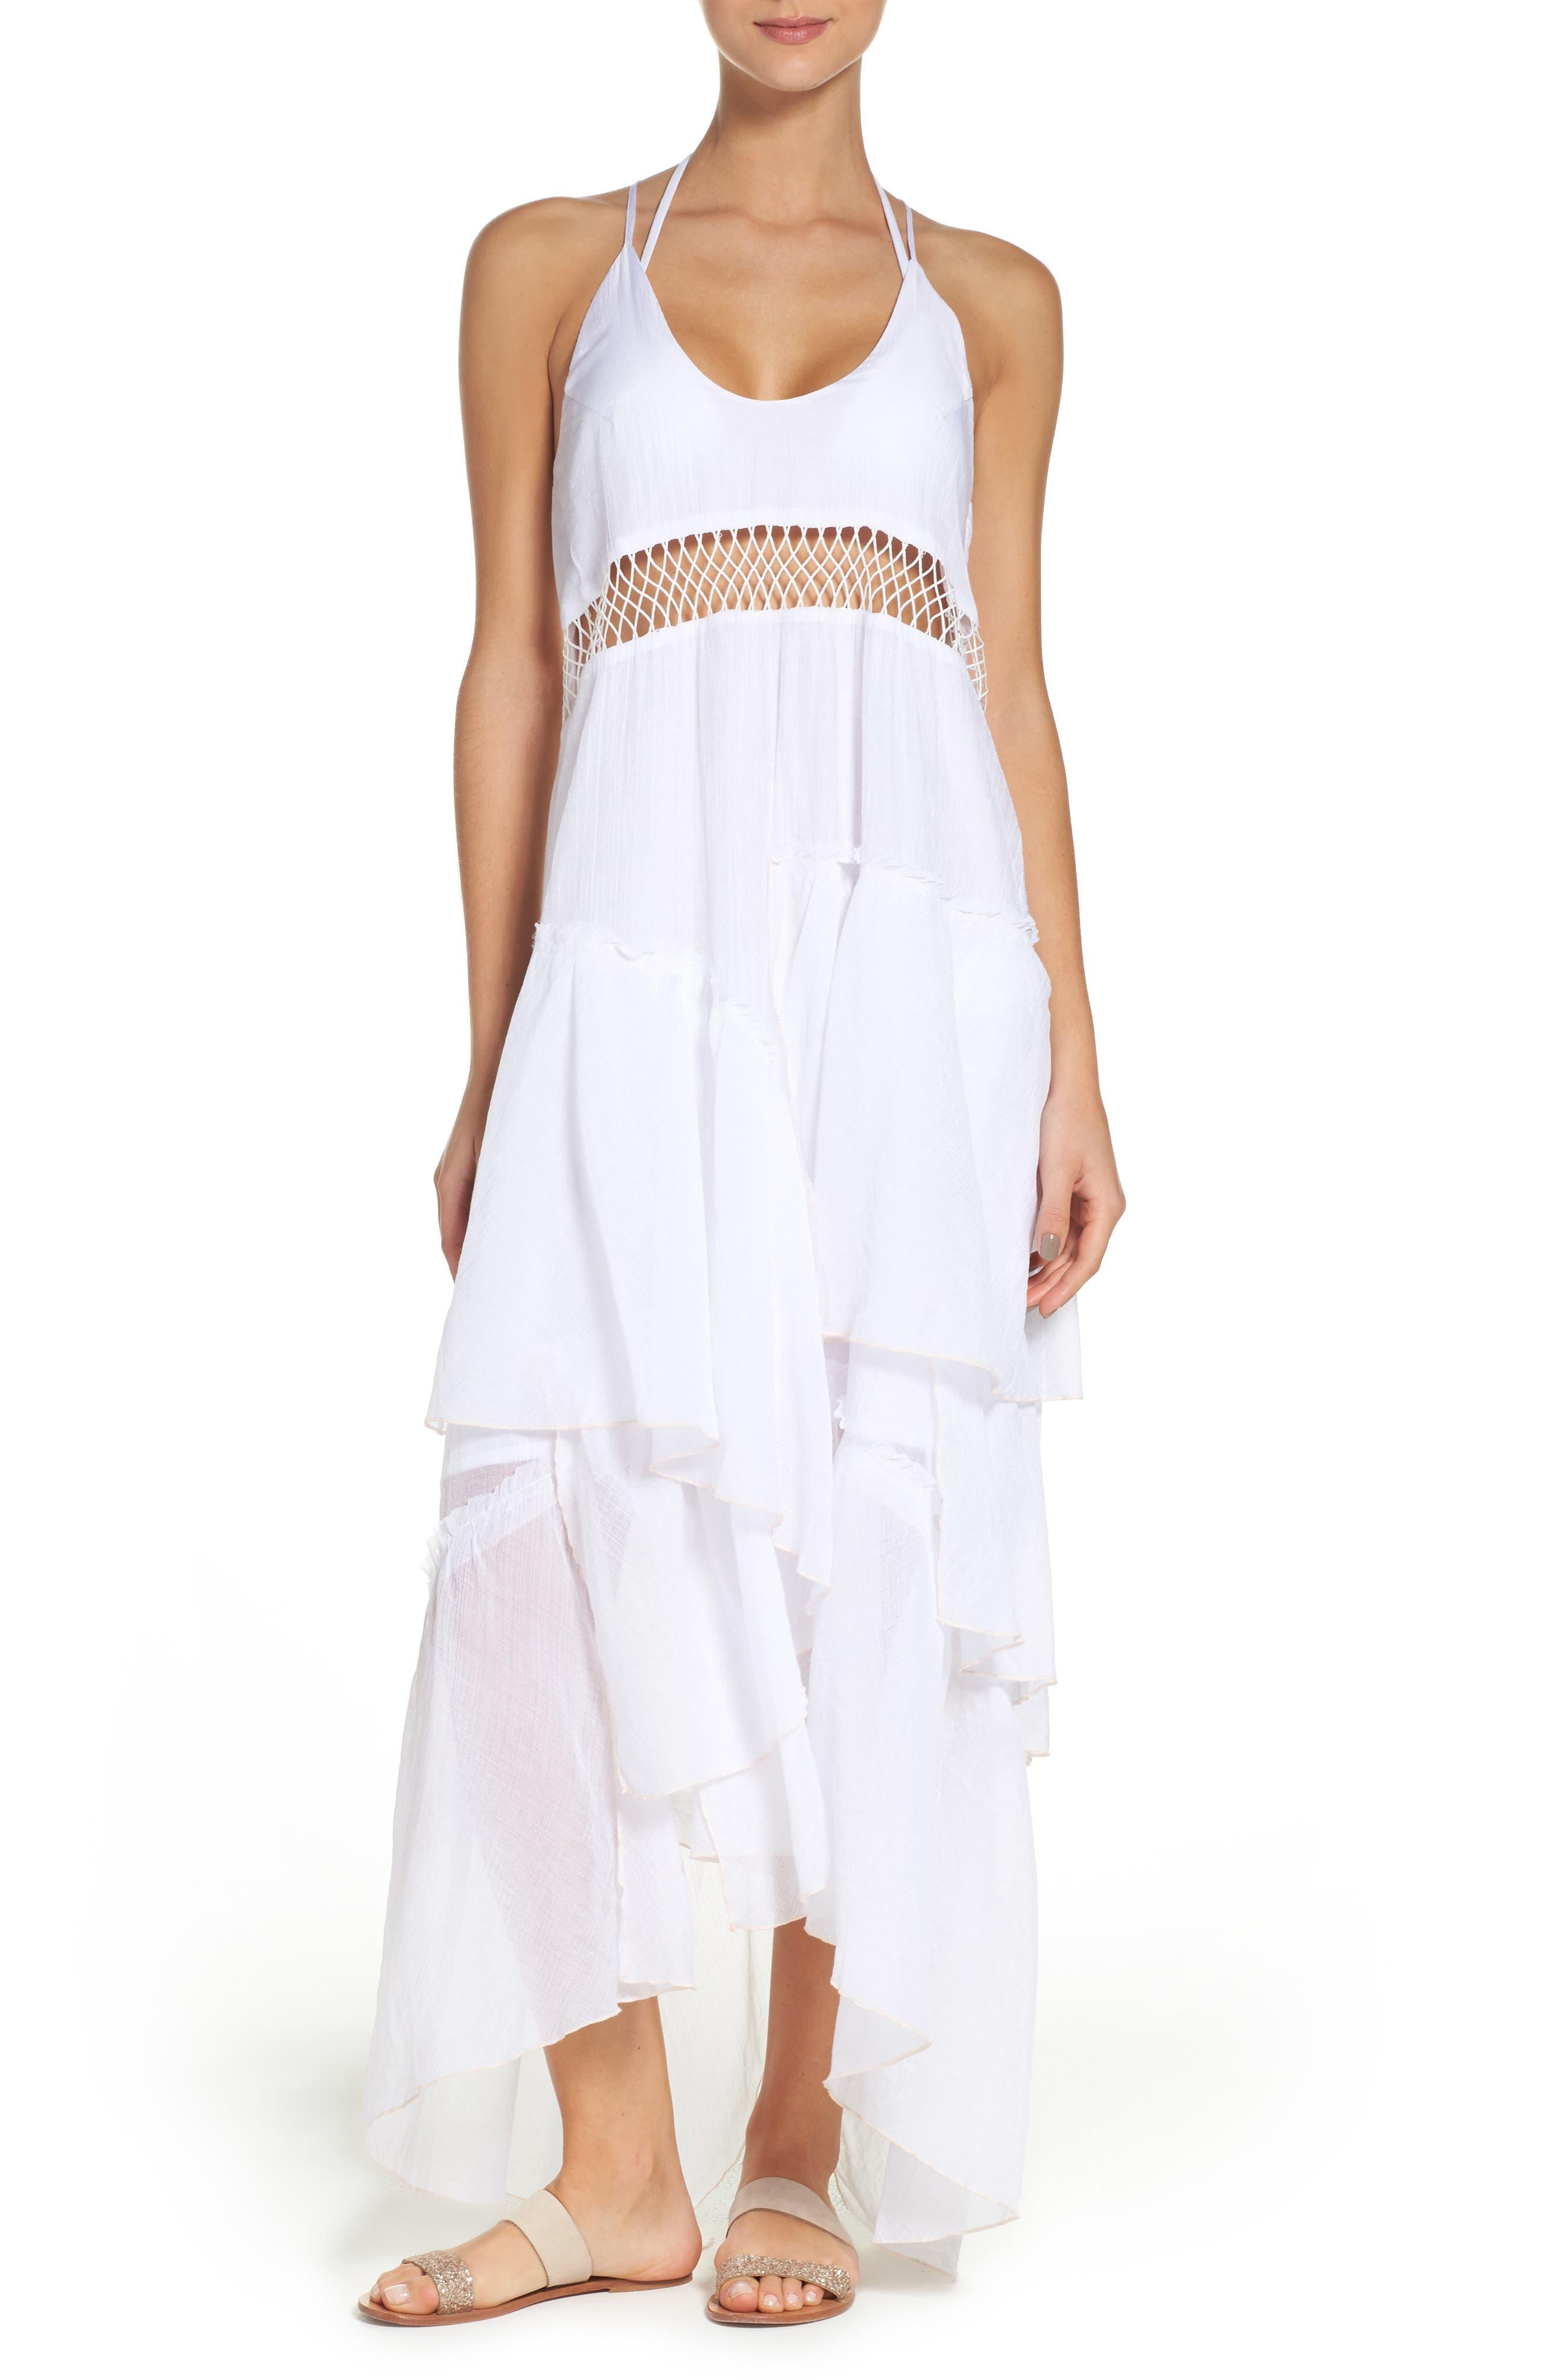 Suboo Closer Frill Cover-Up Maxi Dress